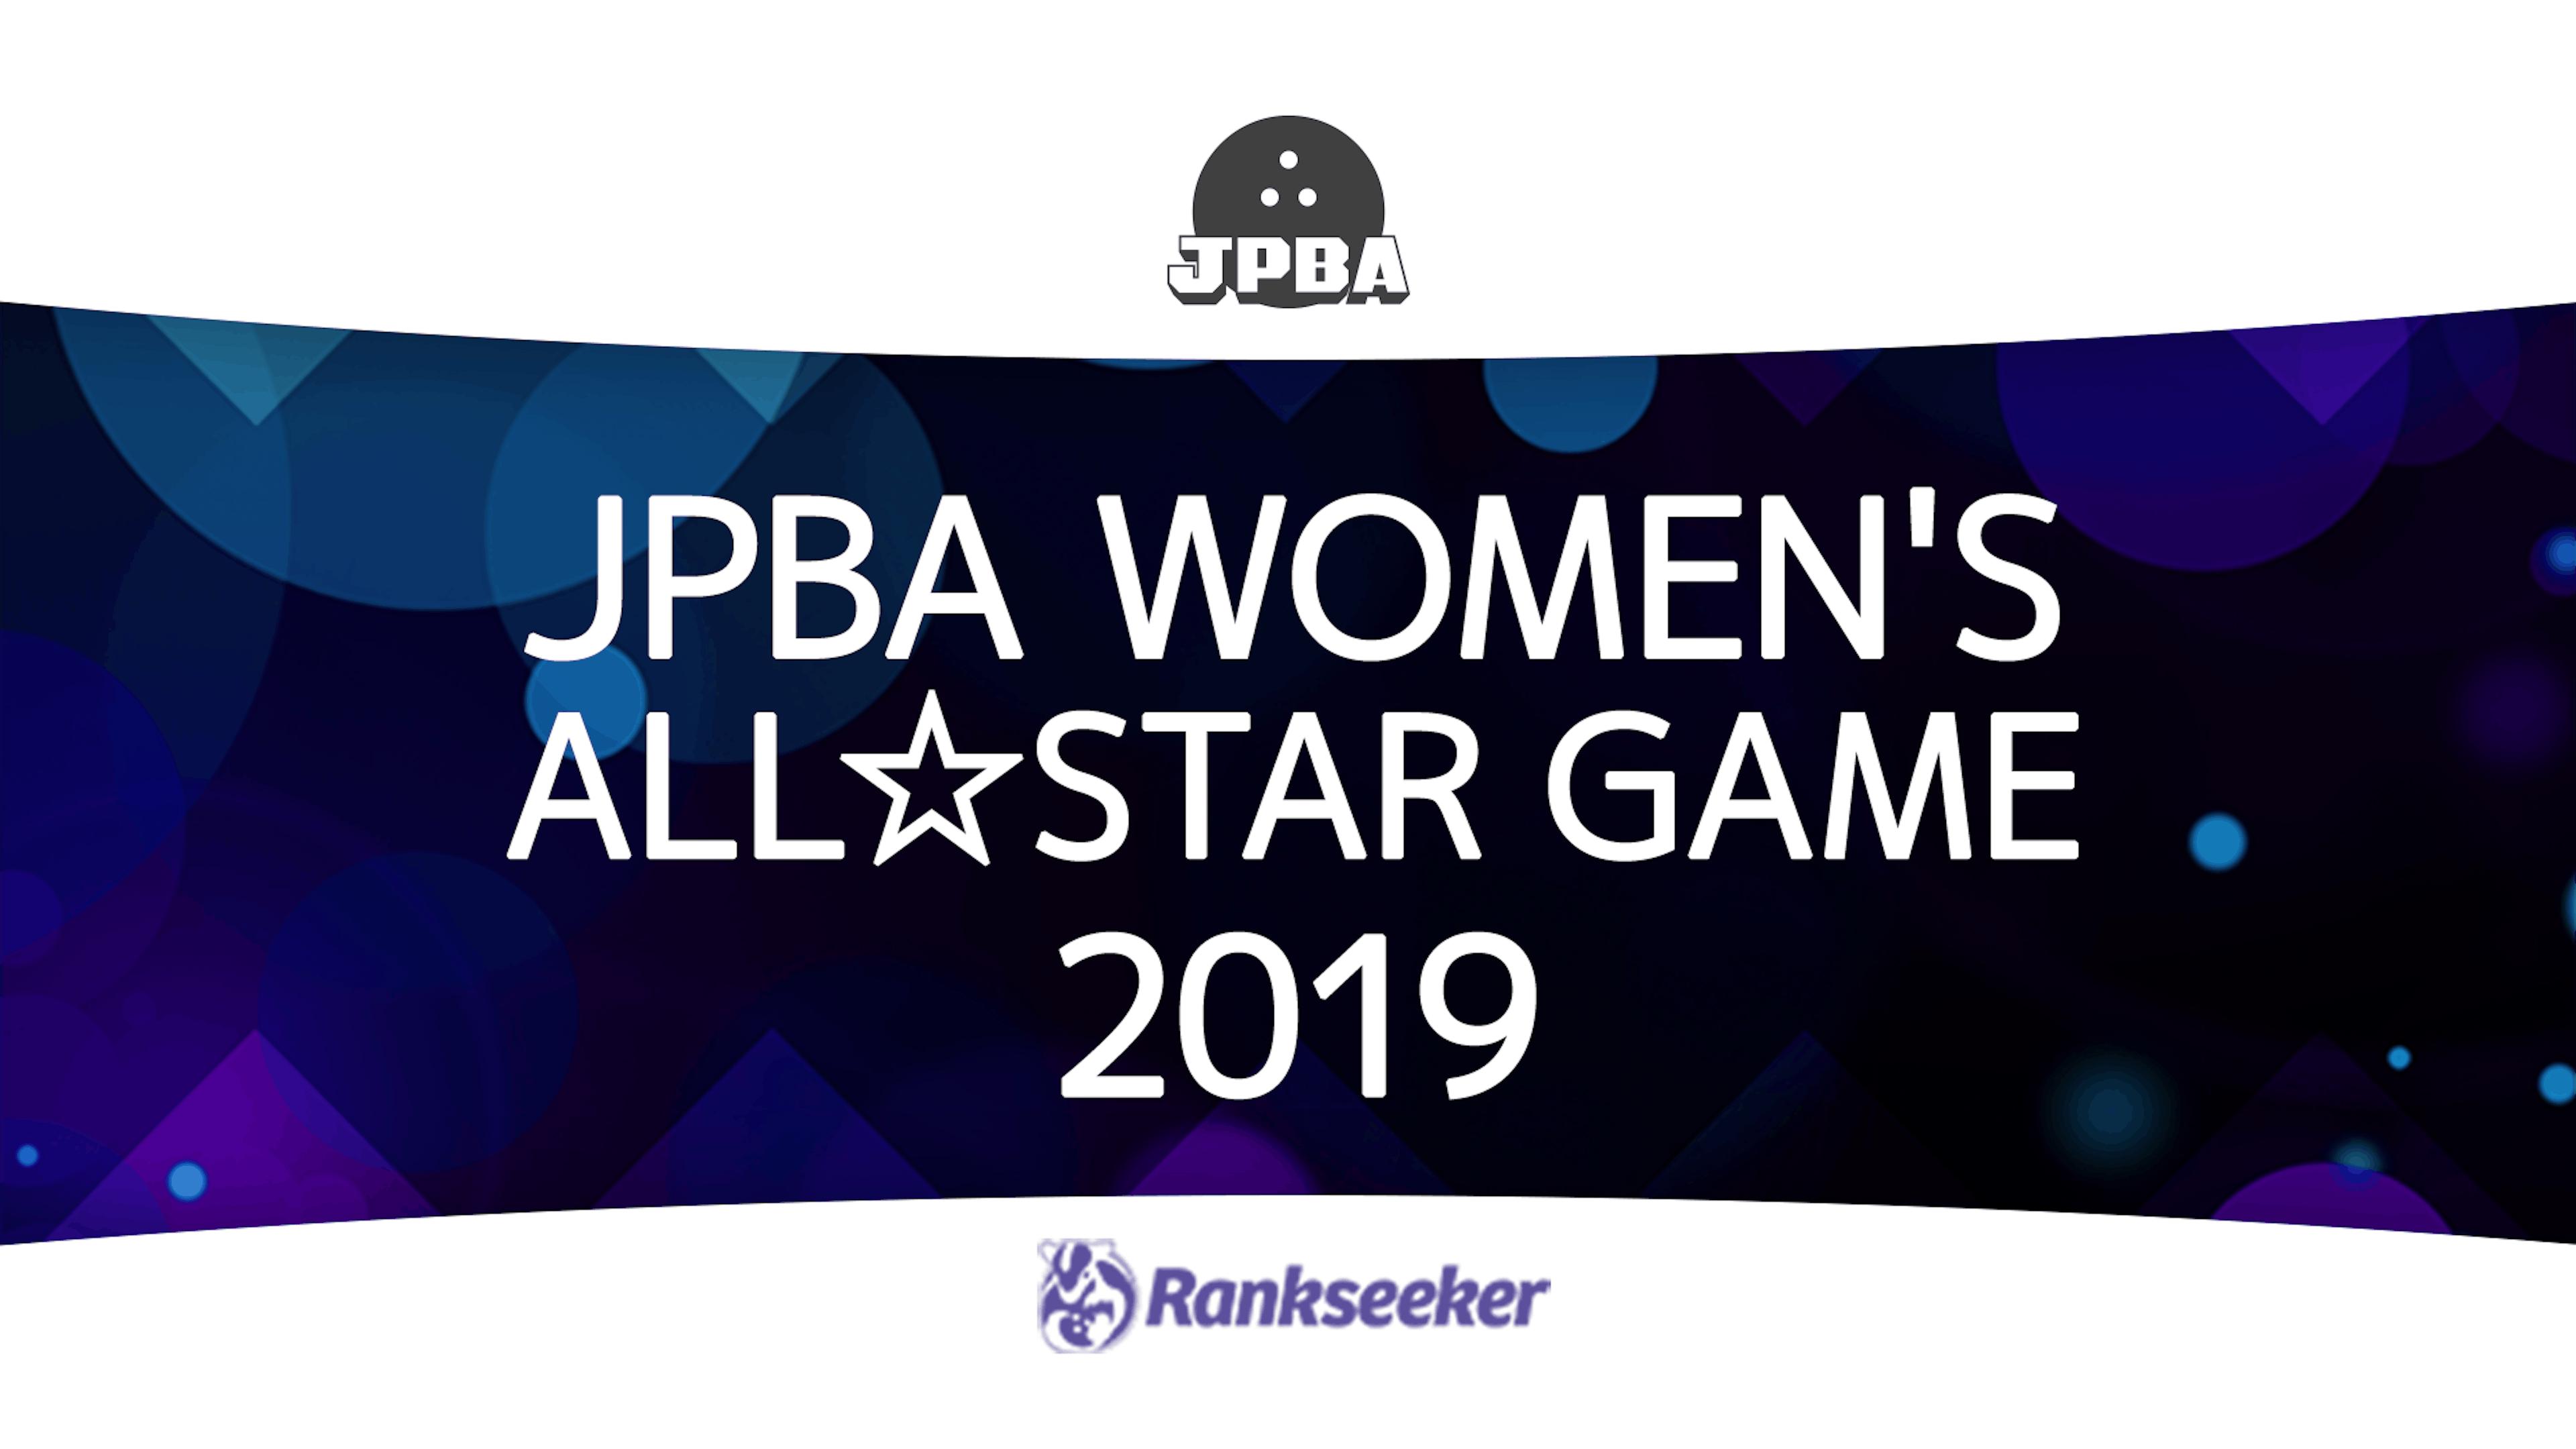 JPBA WOMEN'S ALL☆STAR GAME 2019